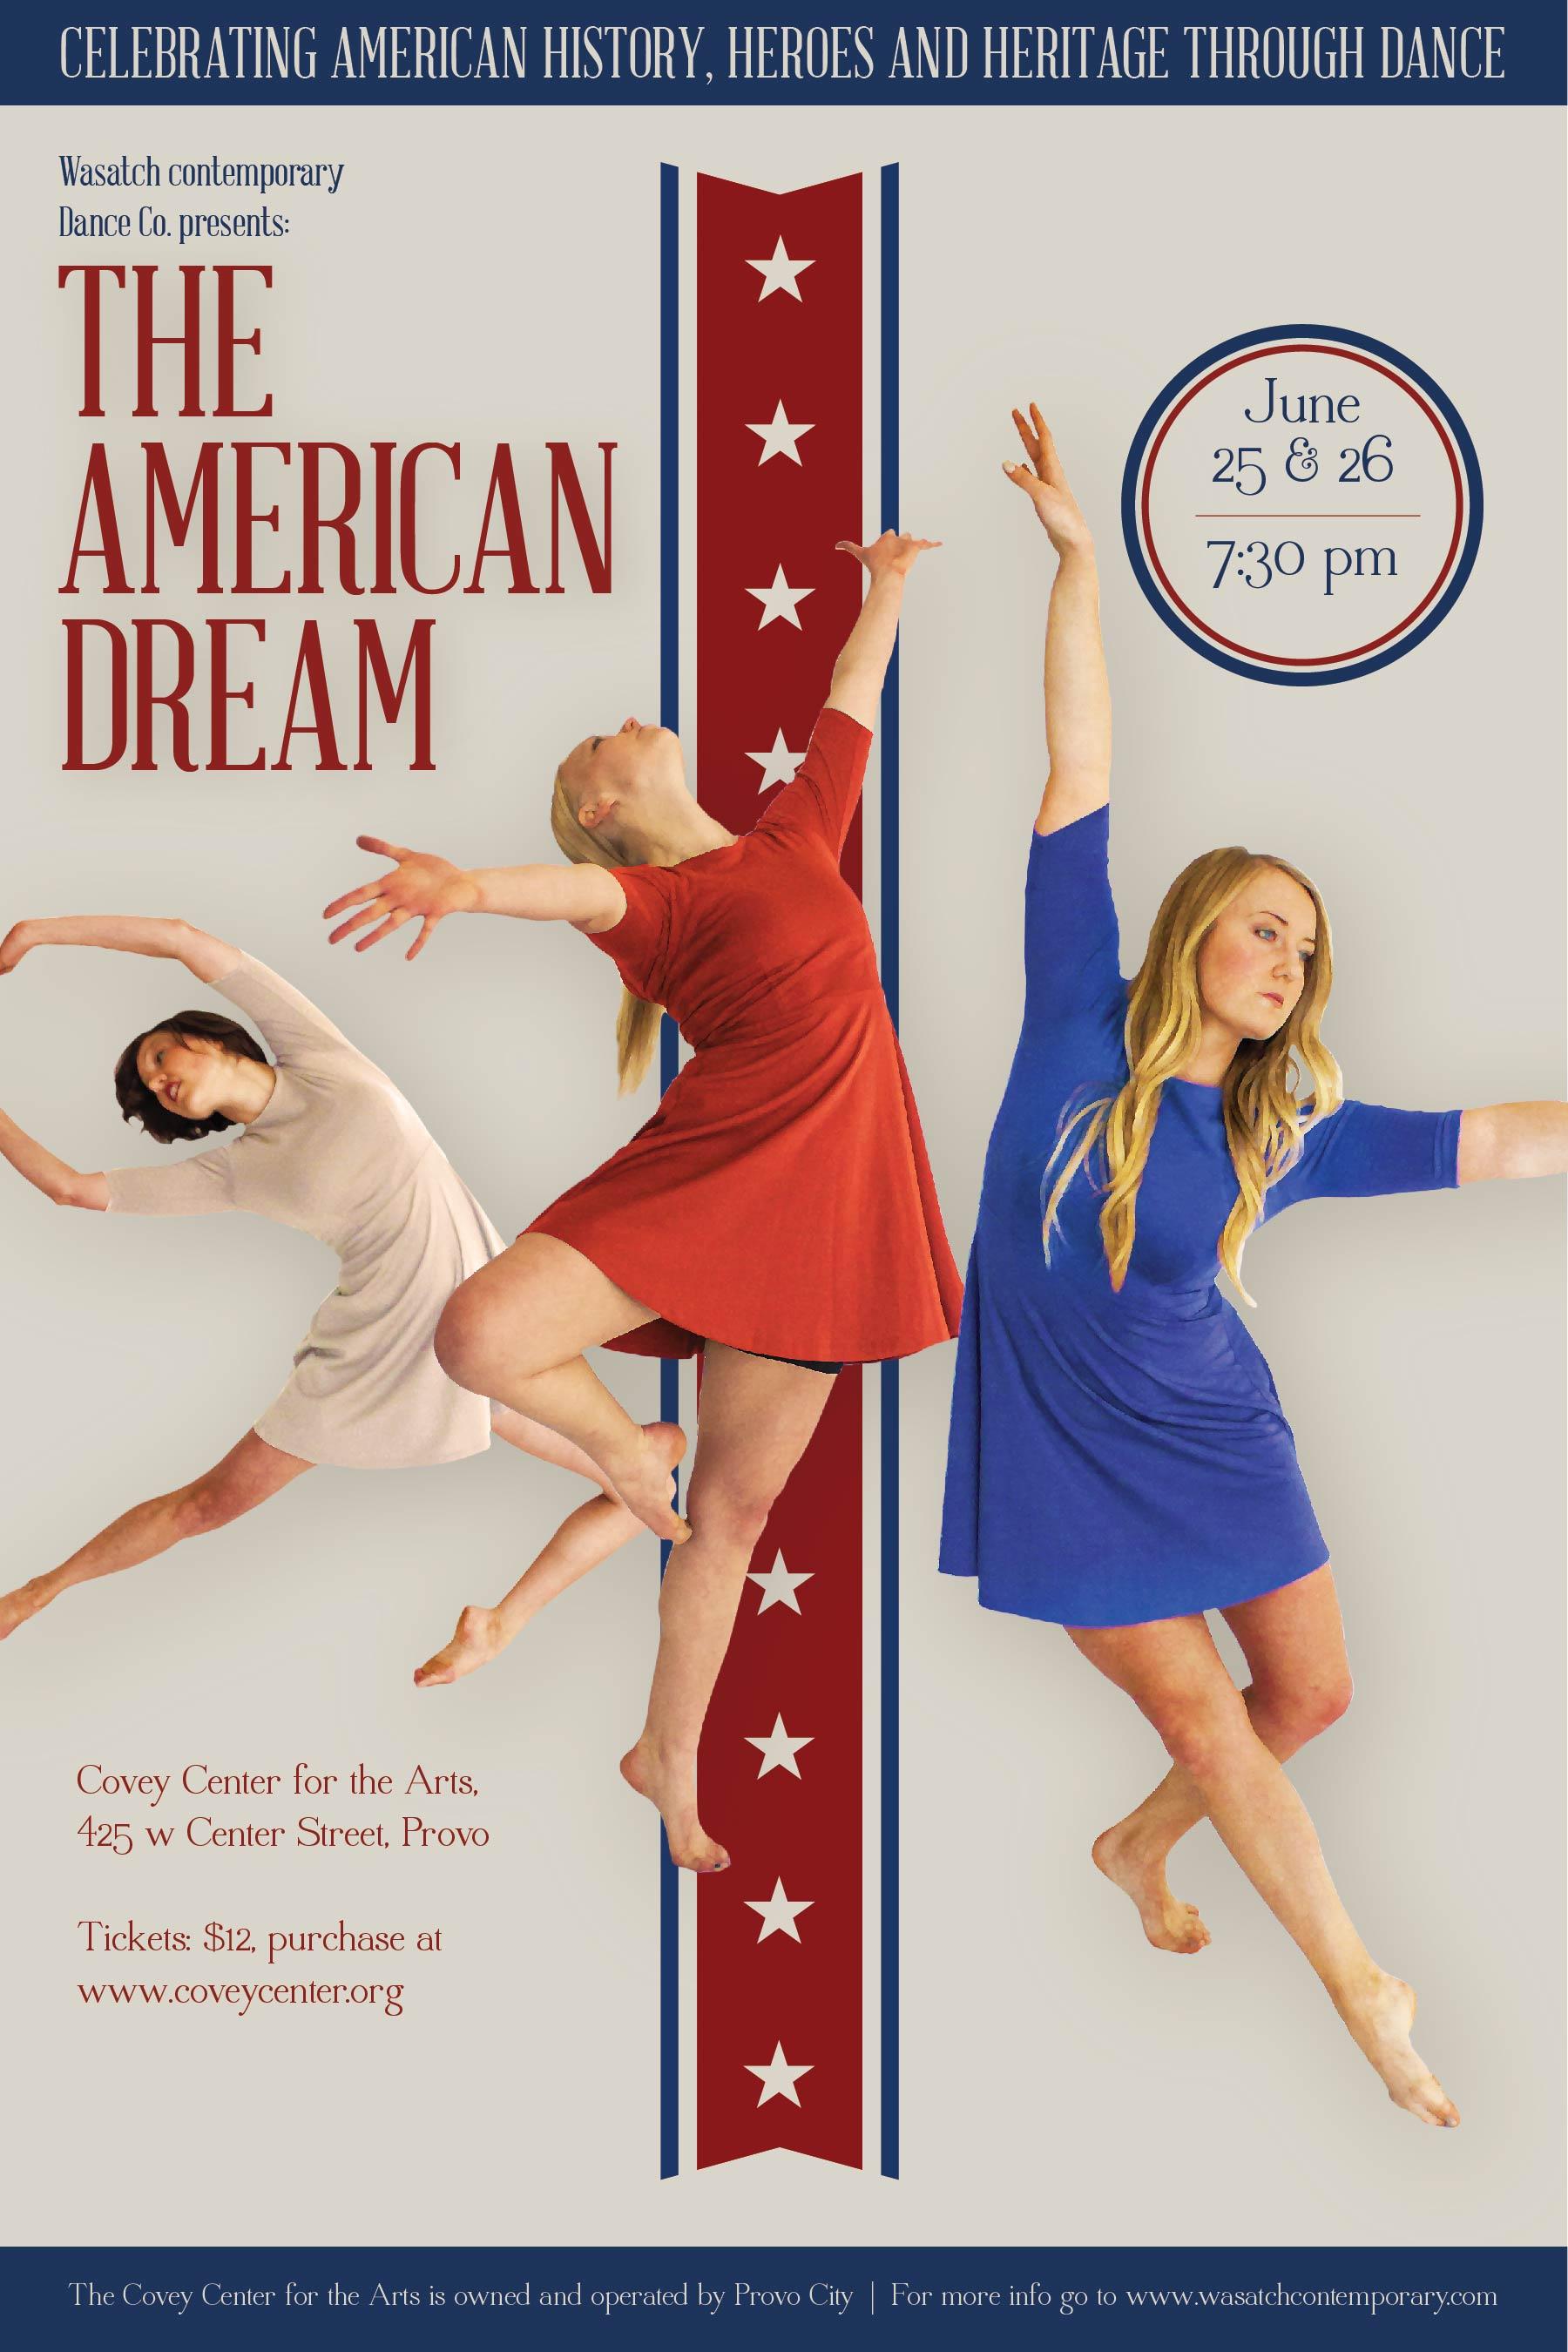 1403_WCDC_American Dream_v1-02